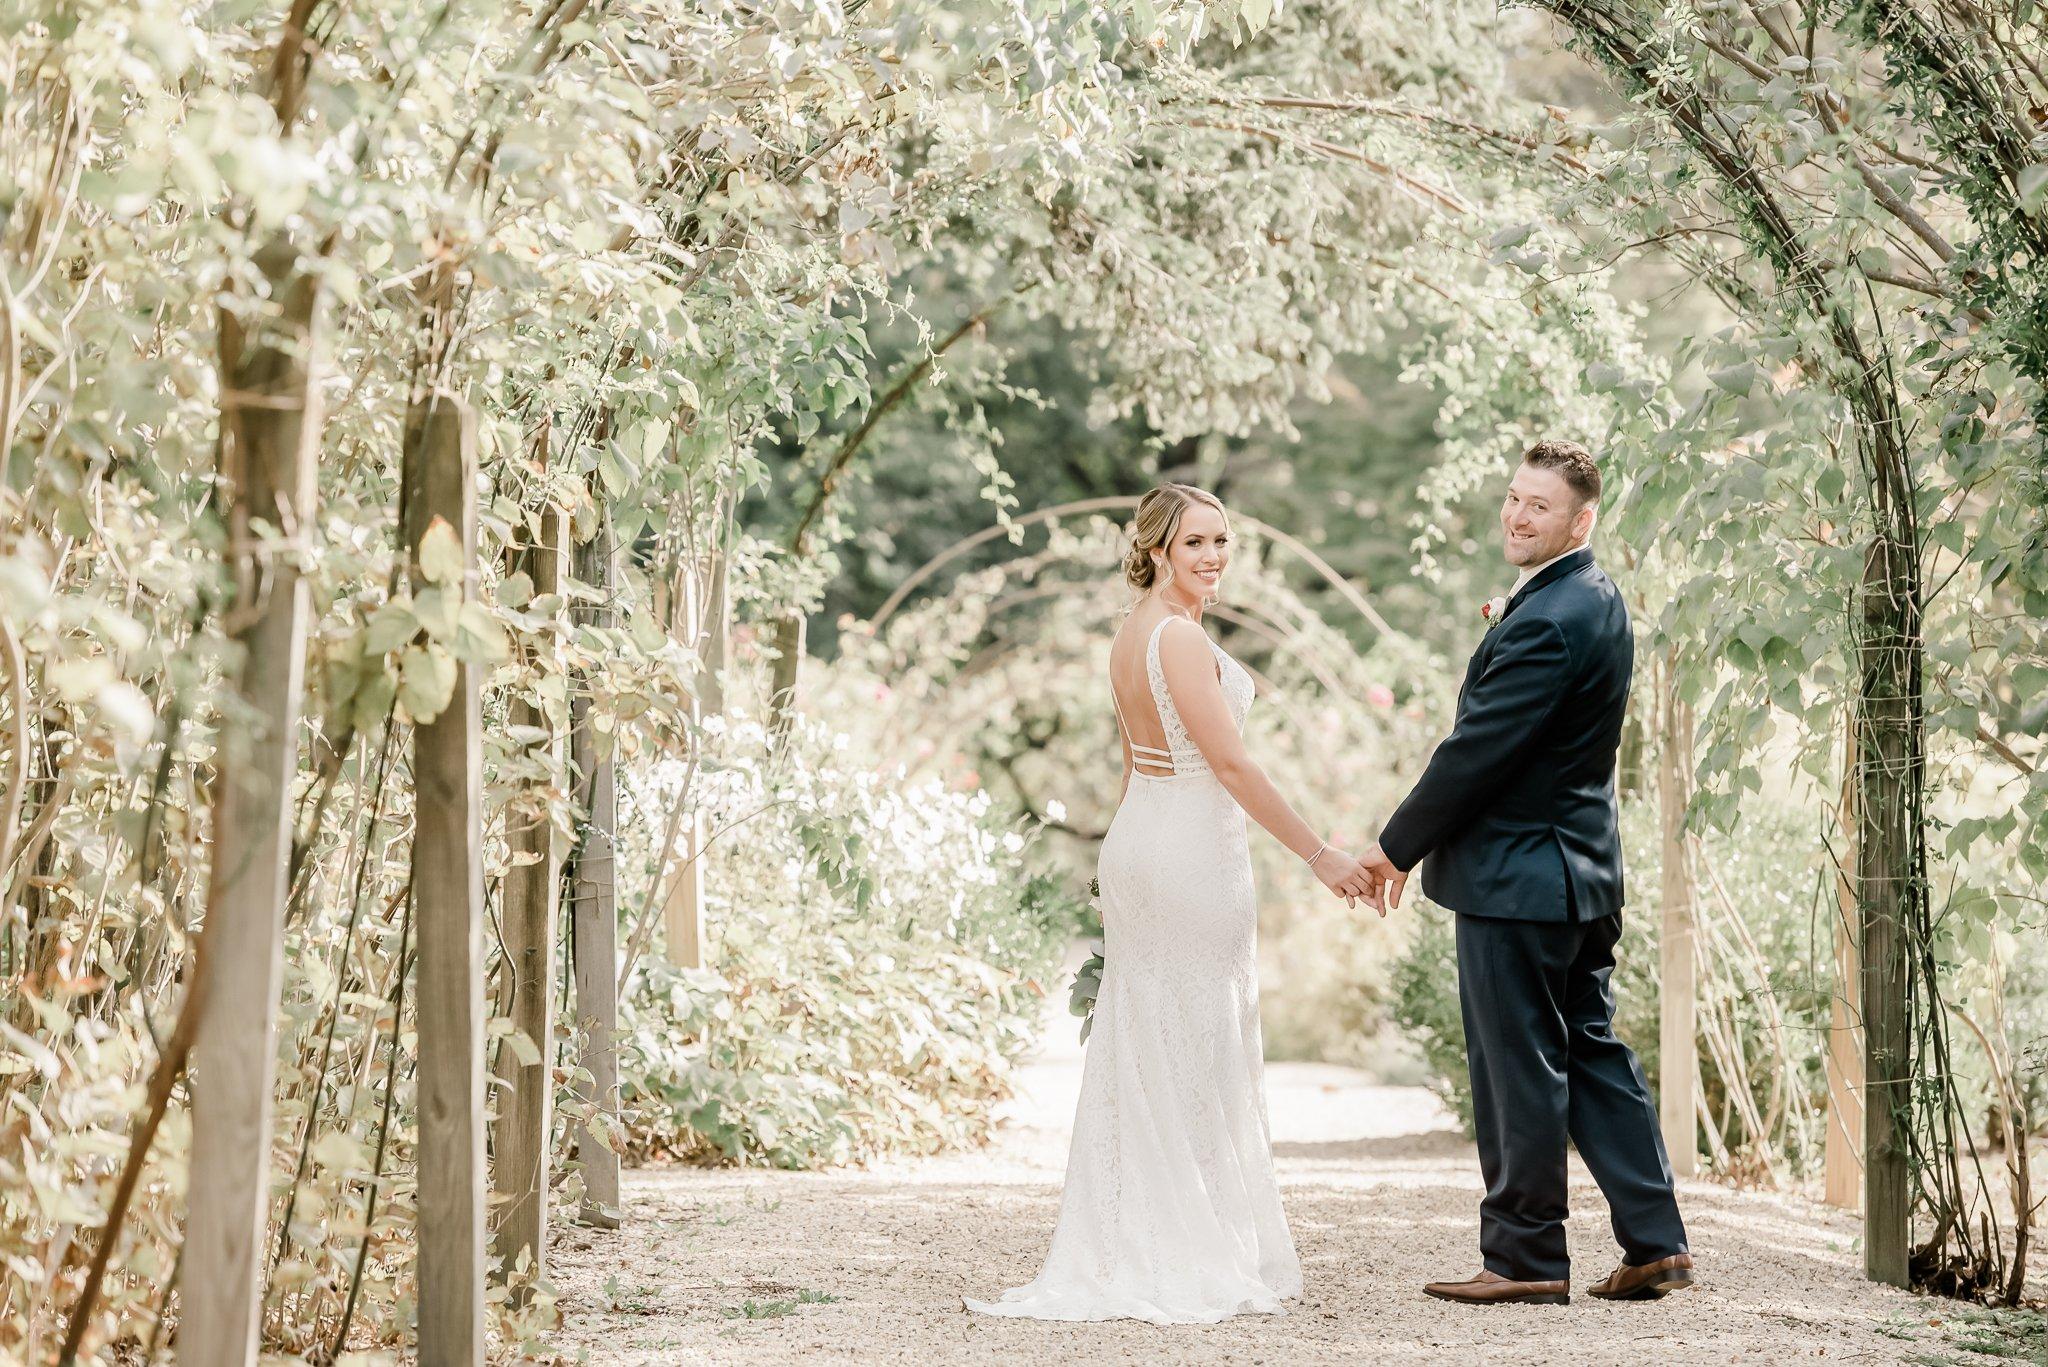 Romantic Wedding Photos at Soundview-59